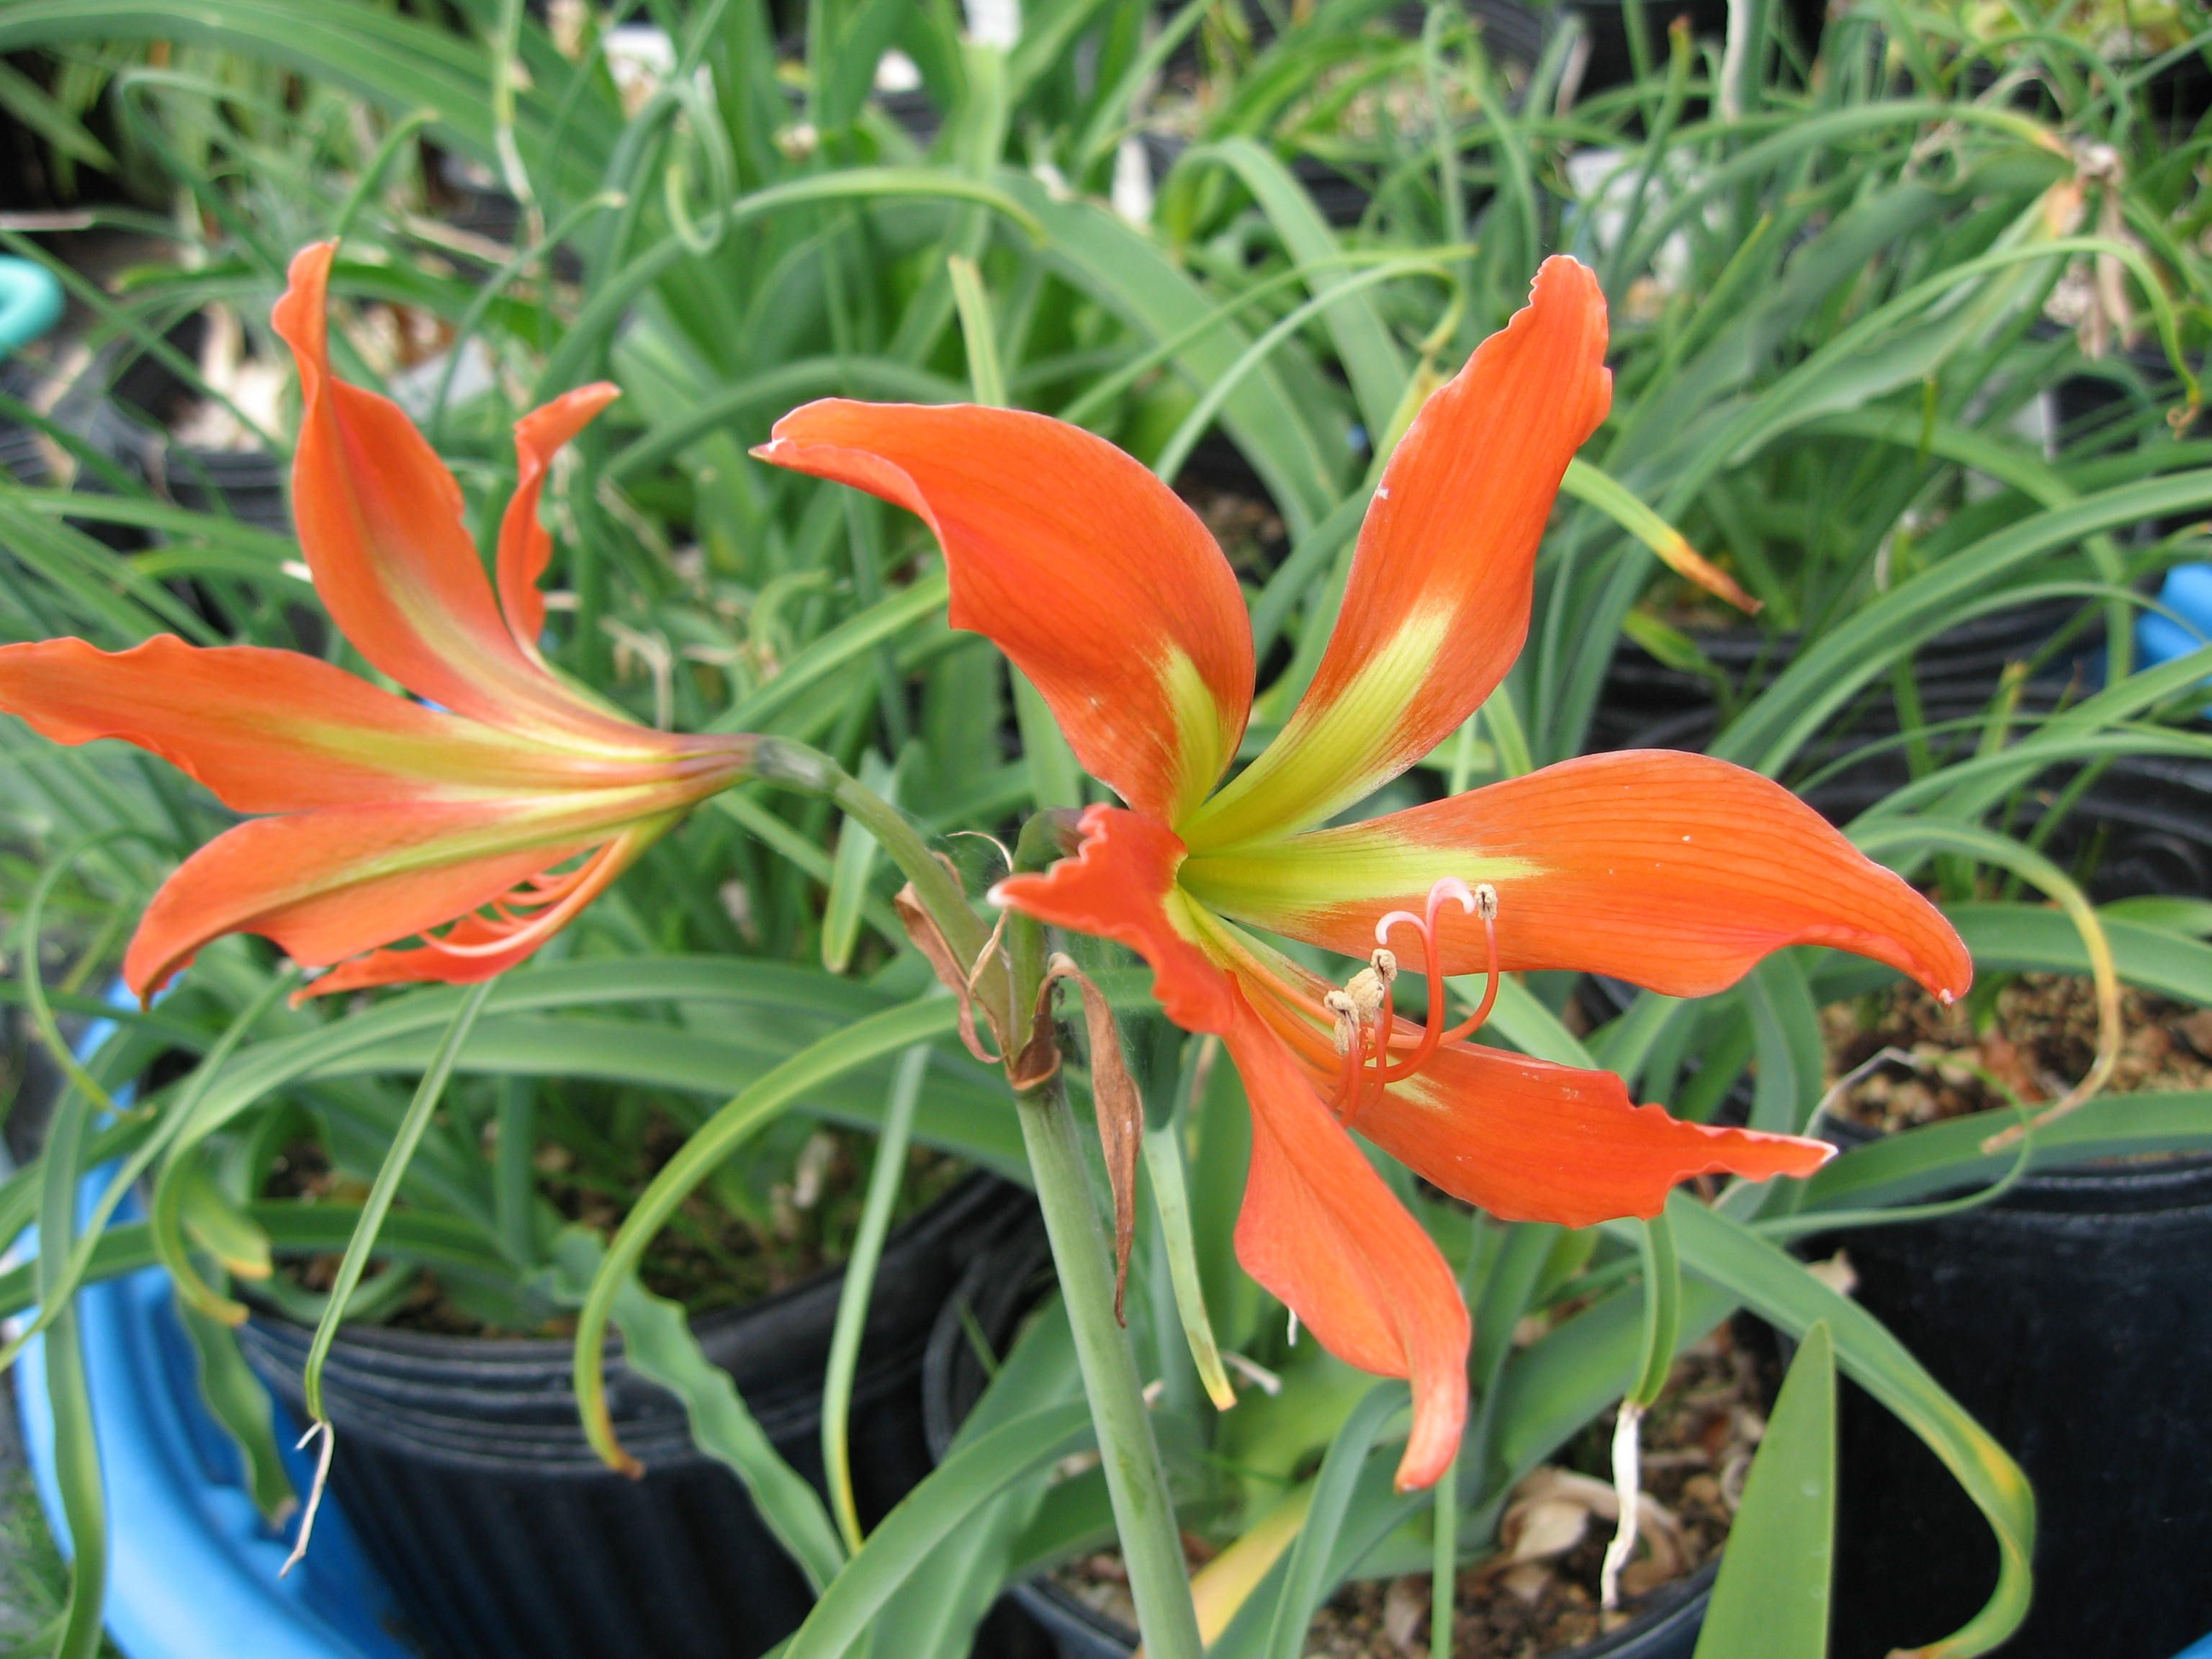 H 5705 Hippeastrum Blossfeldiae Each 25 00 Beautiful Tangerine